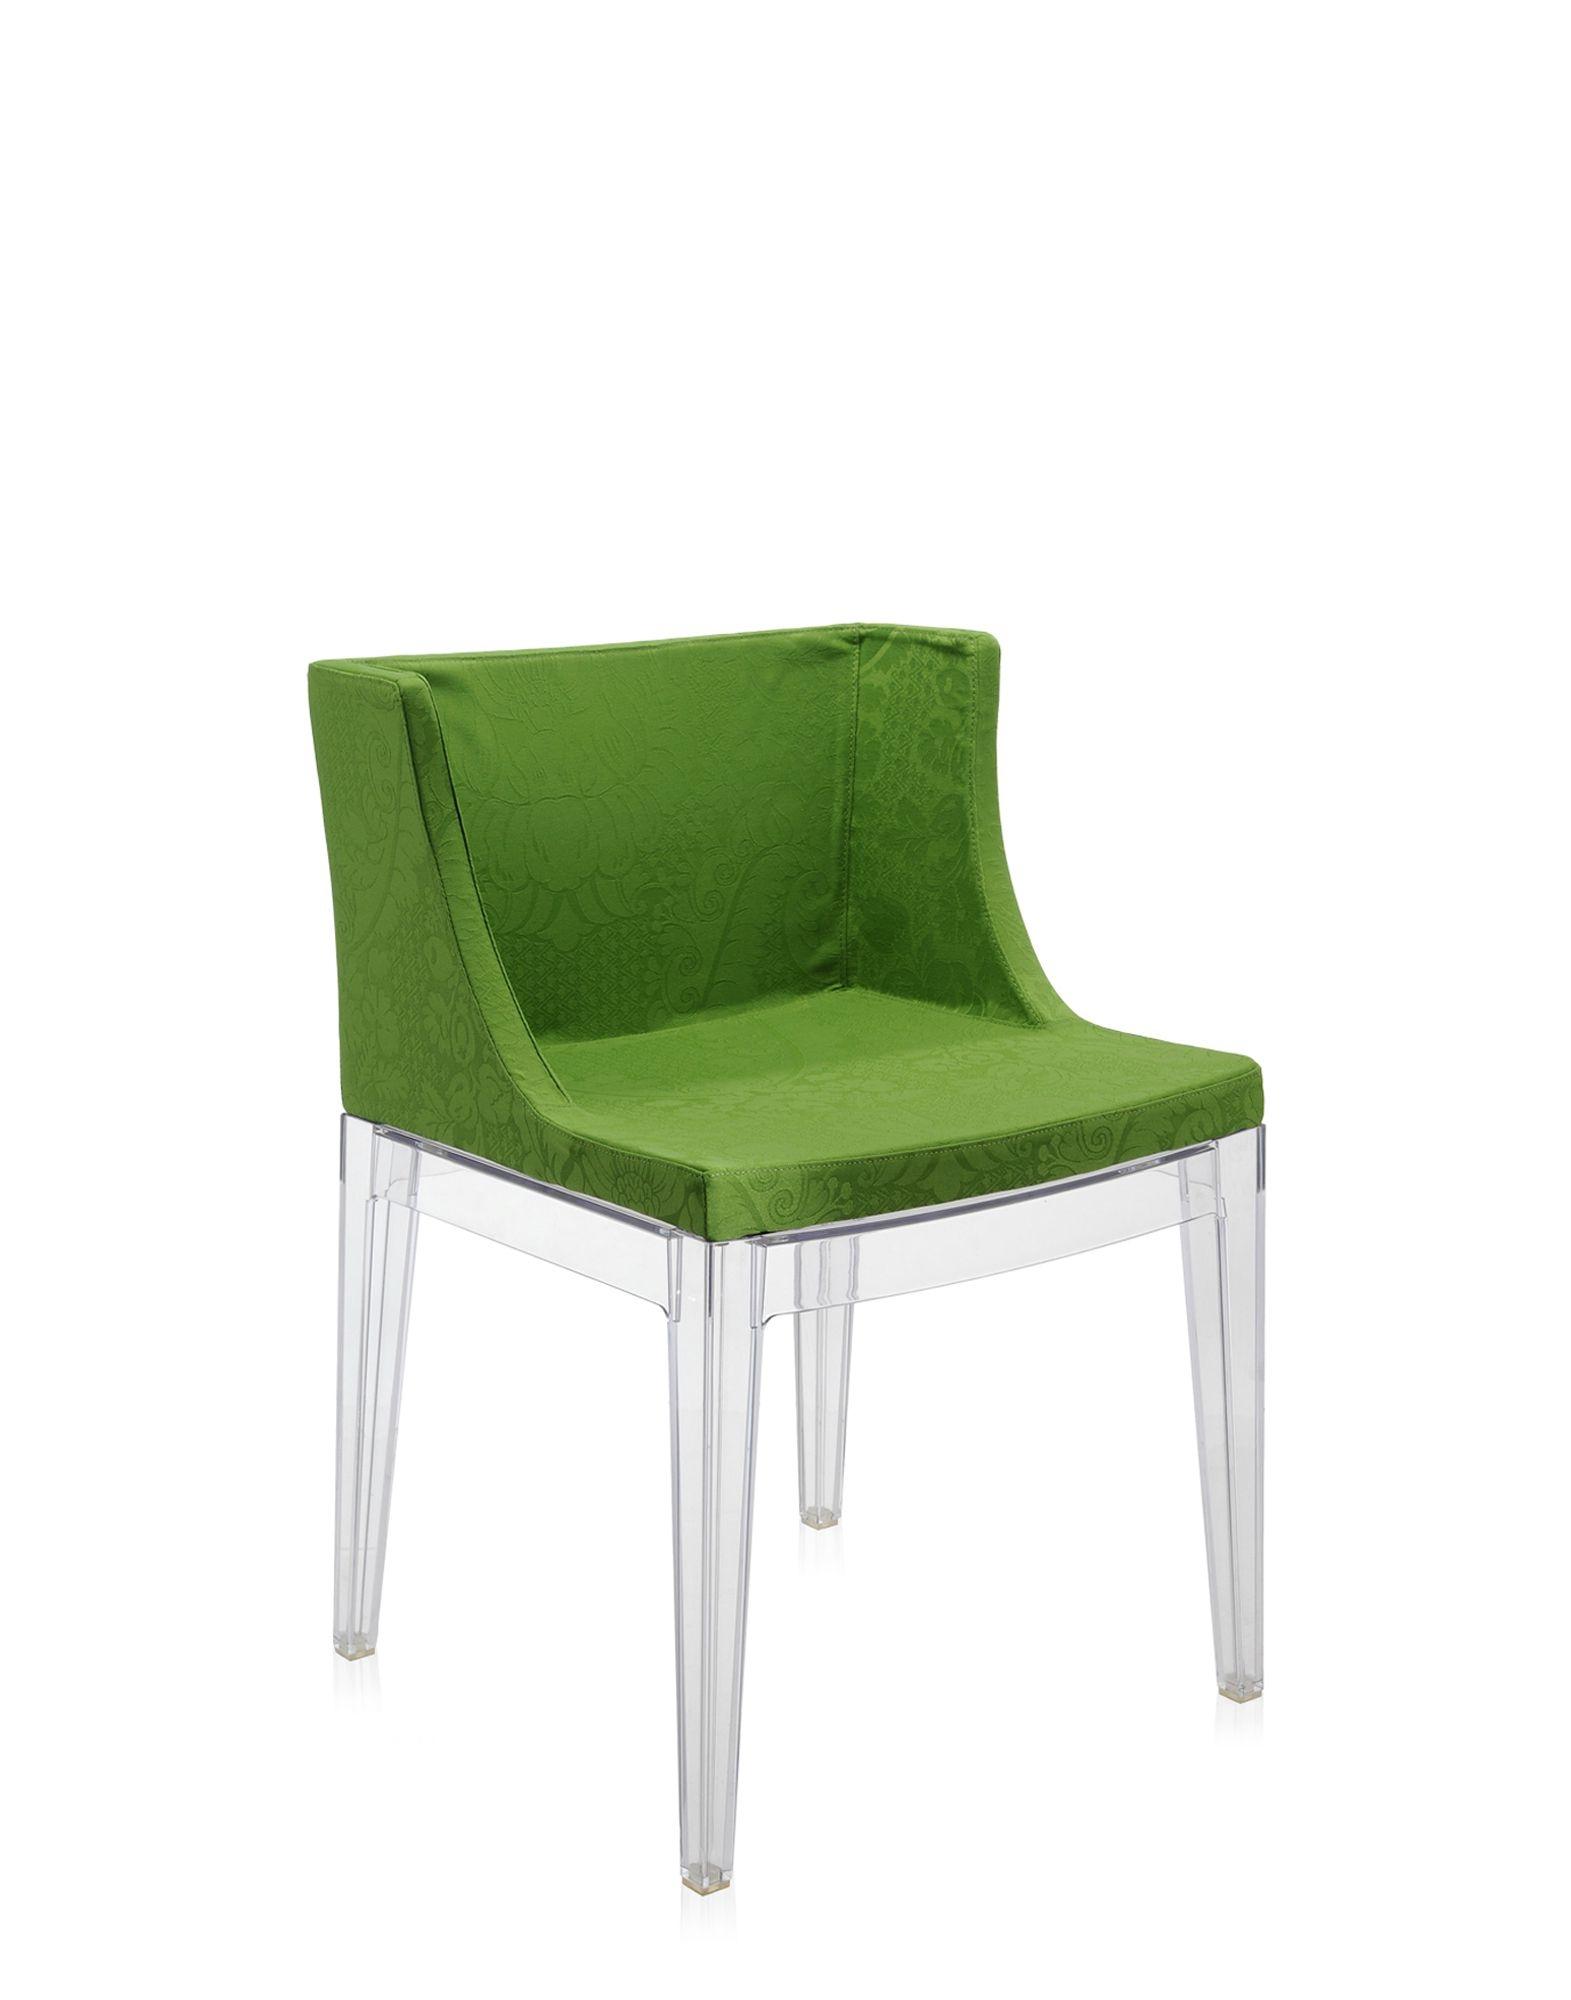 Sedia kartell scontata del 50 mademoiselle sedie a for Sedia design kartell